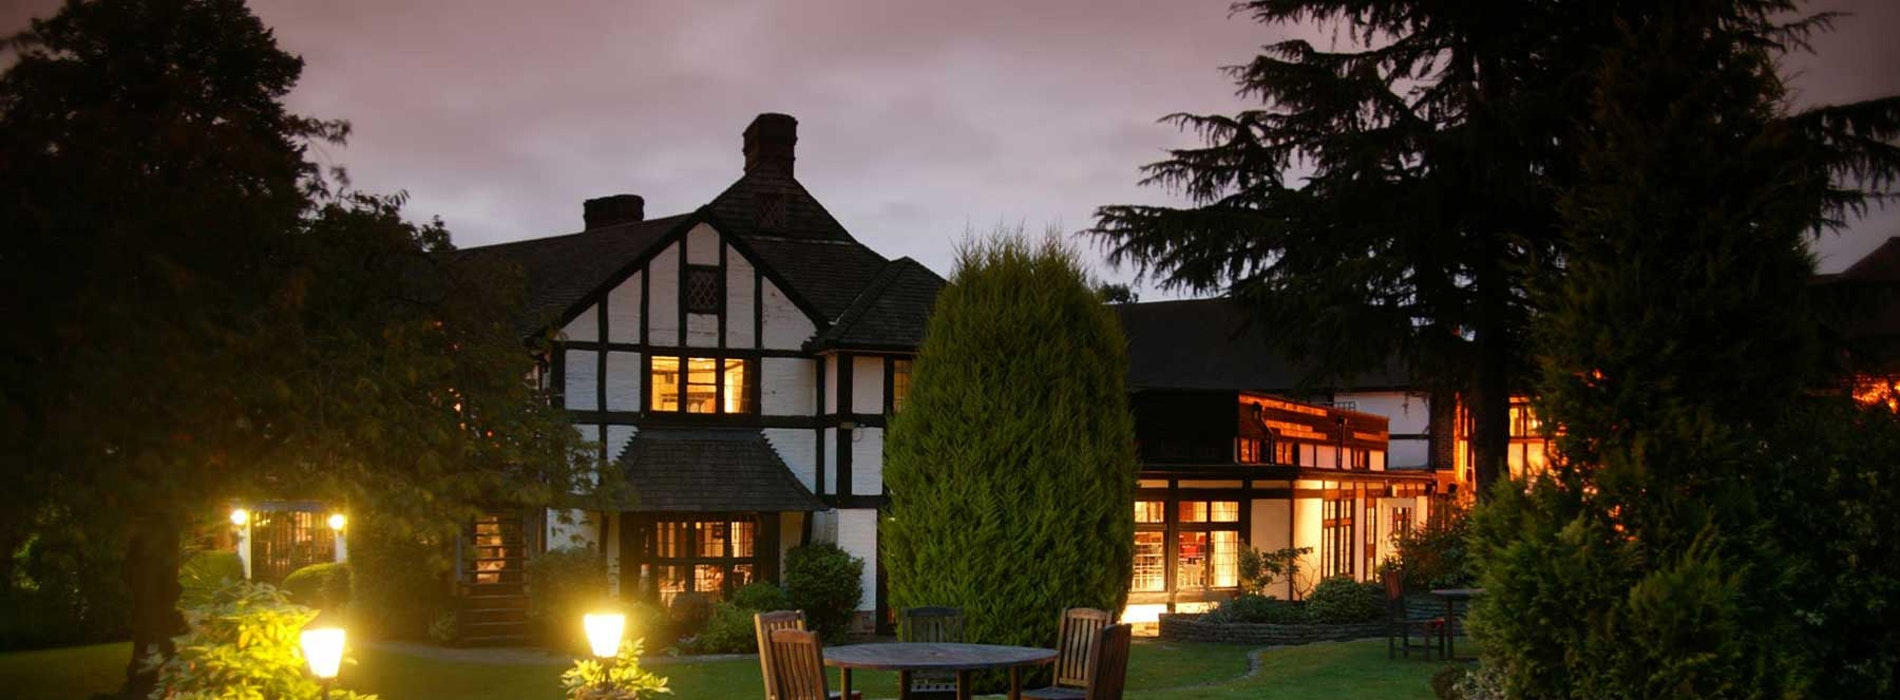 Doubletree By Hilton Woking near Chessington World of Adventures Resort